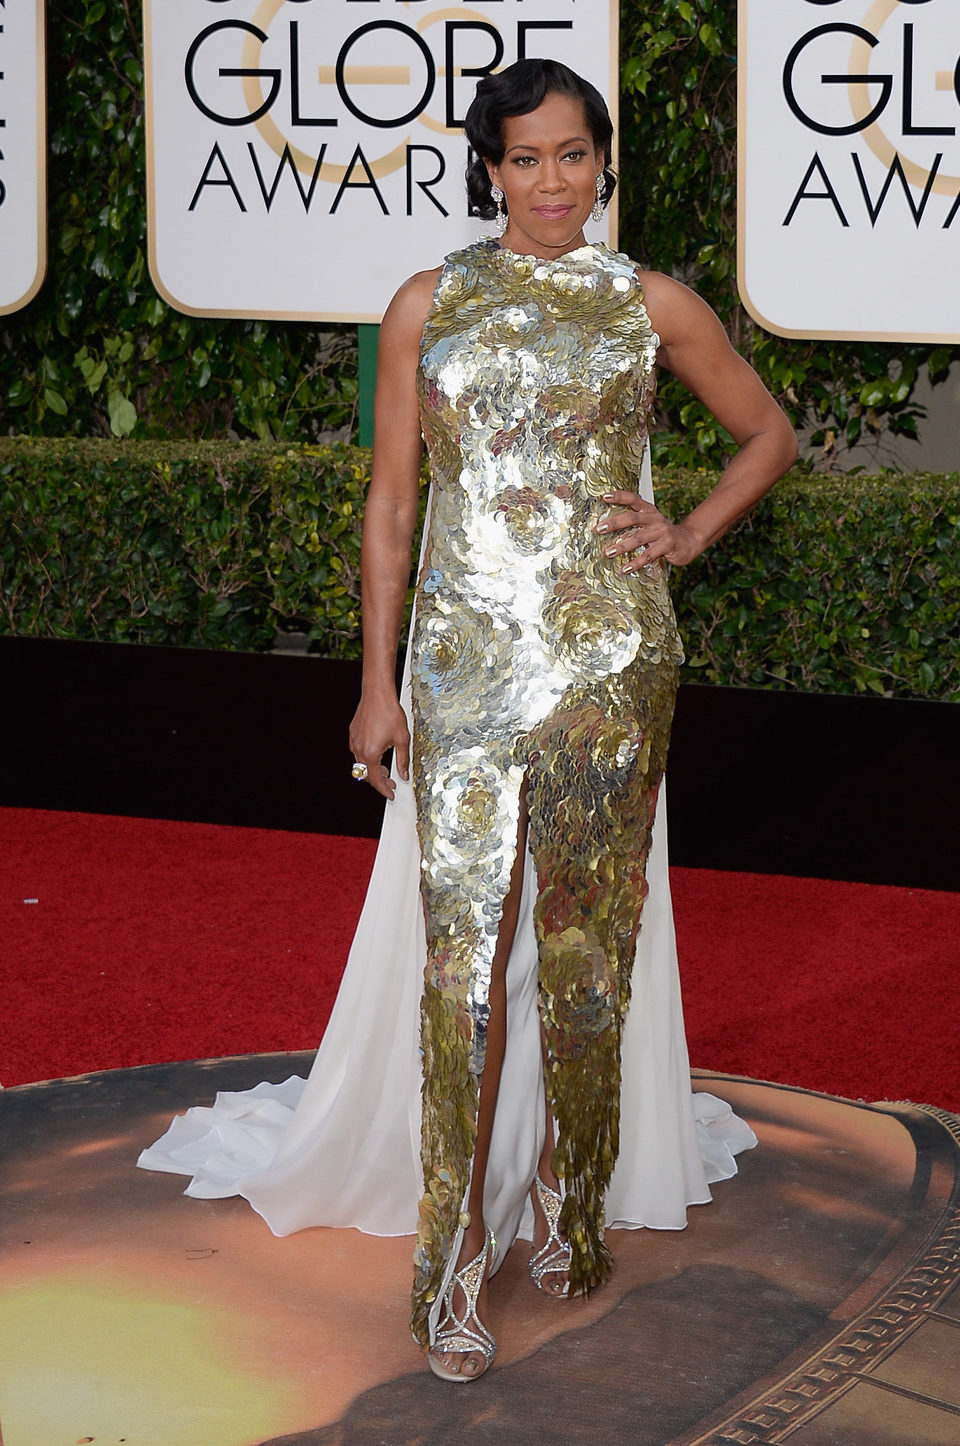 Regina King in the 2016 Golden Globes red carpet